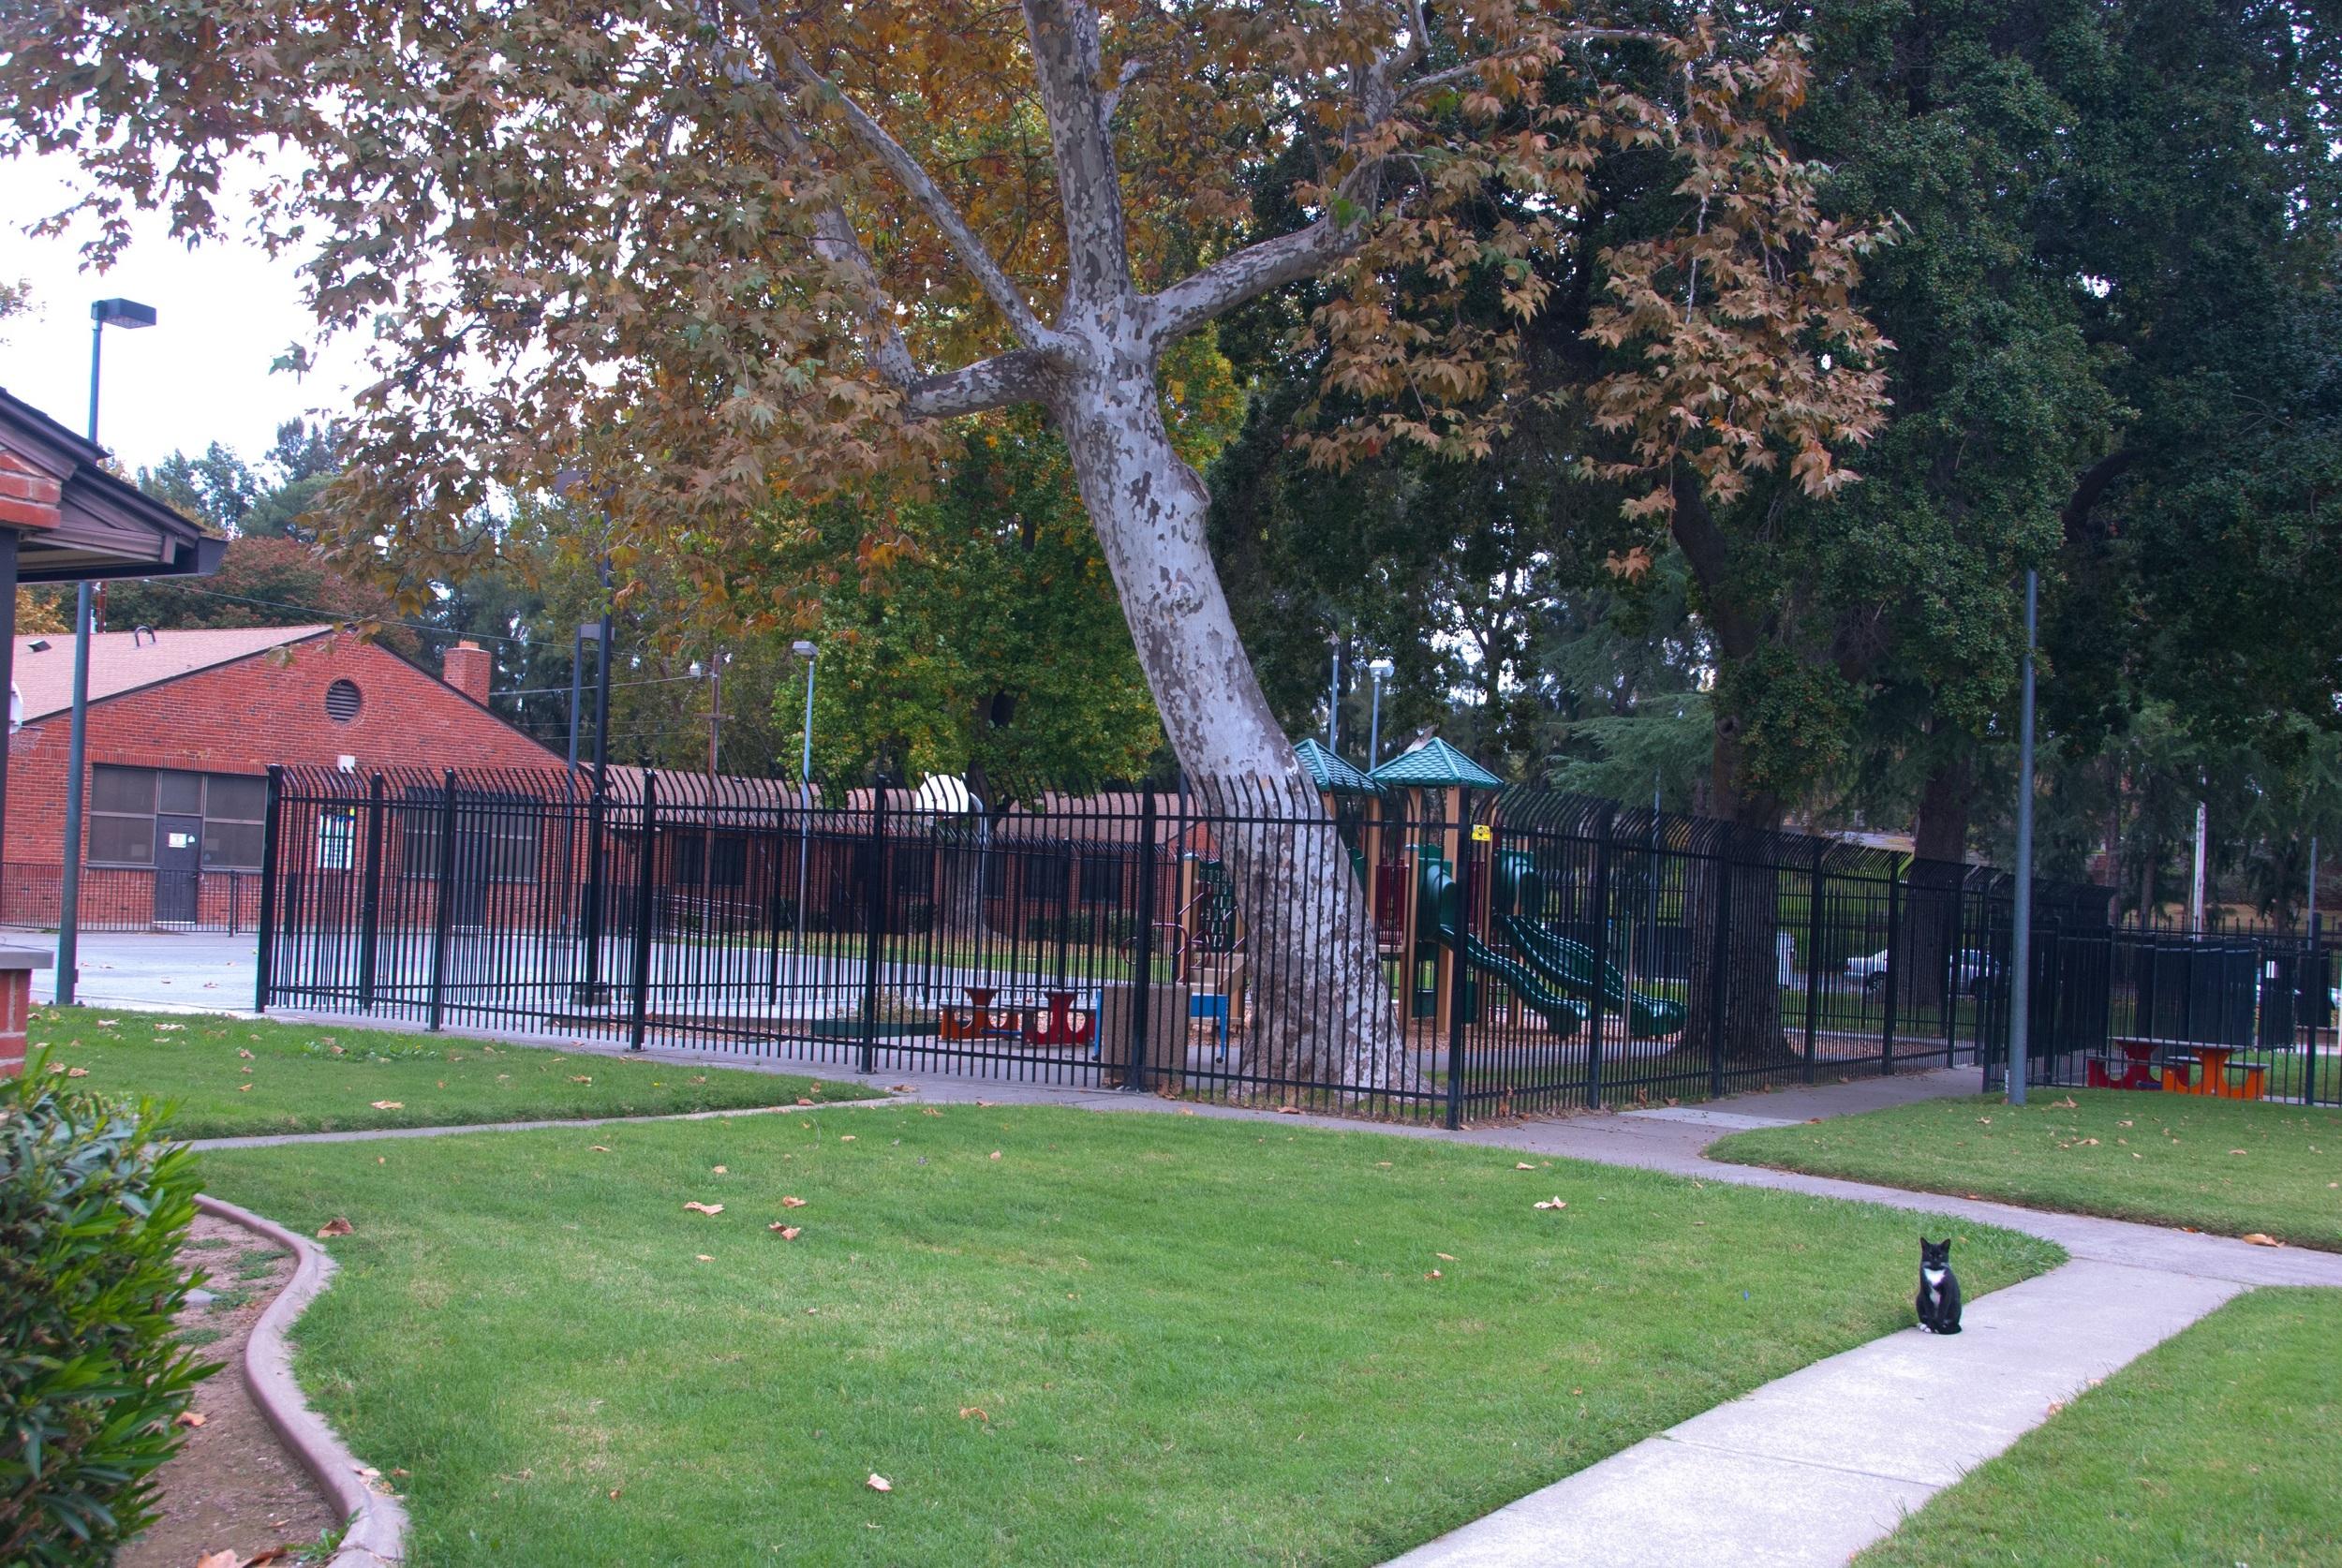 CA_Sacramento_New_Helvetia_Historic_District_0012.jpg